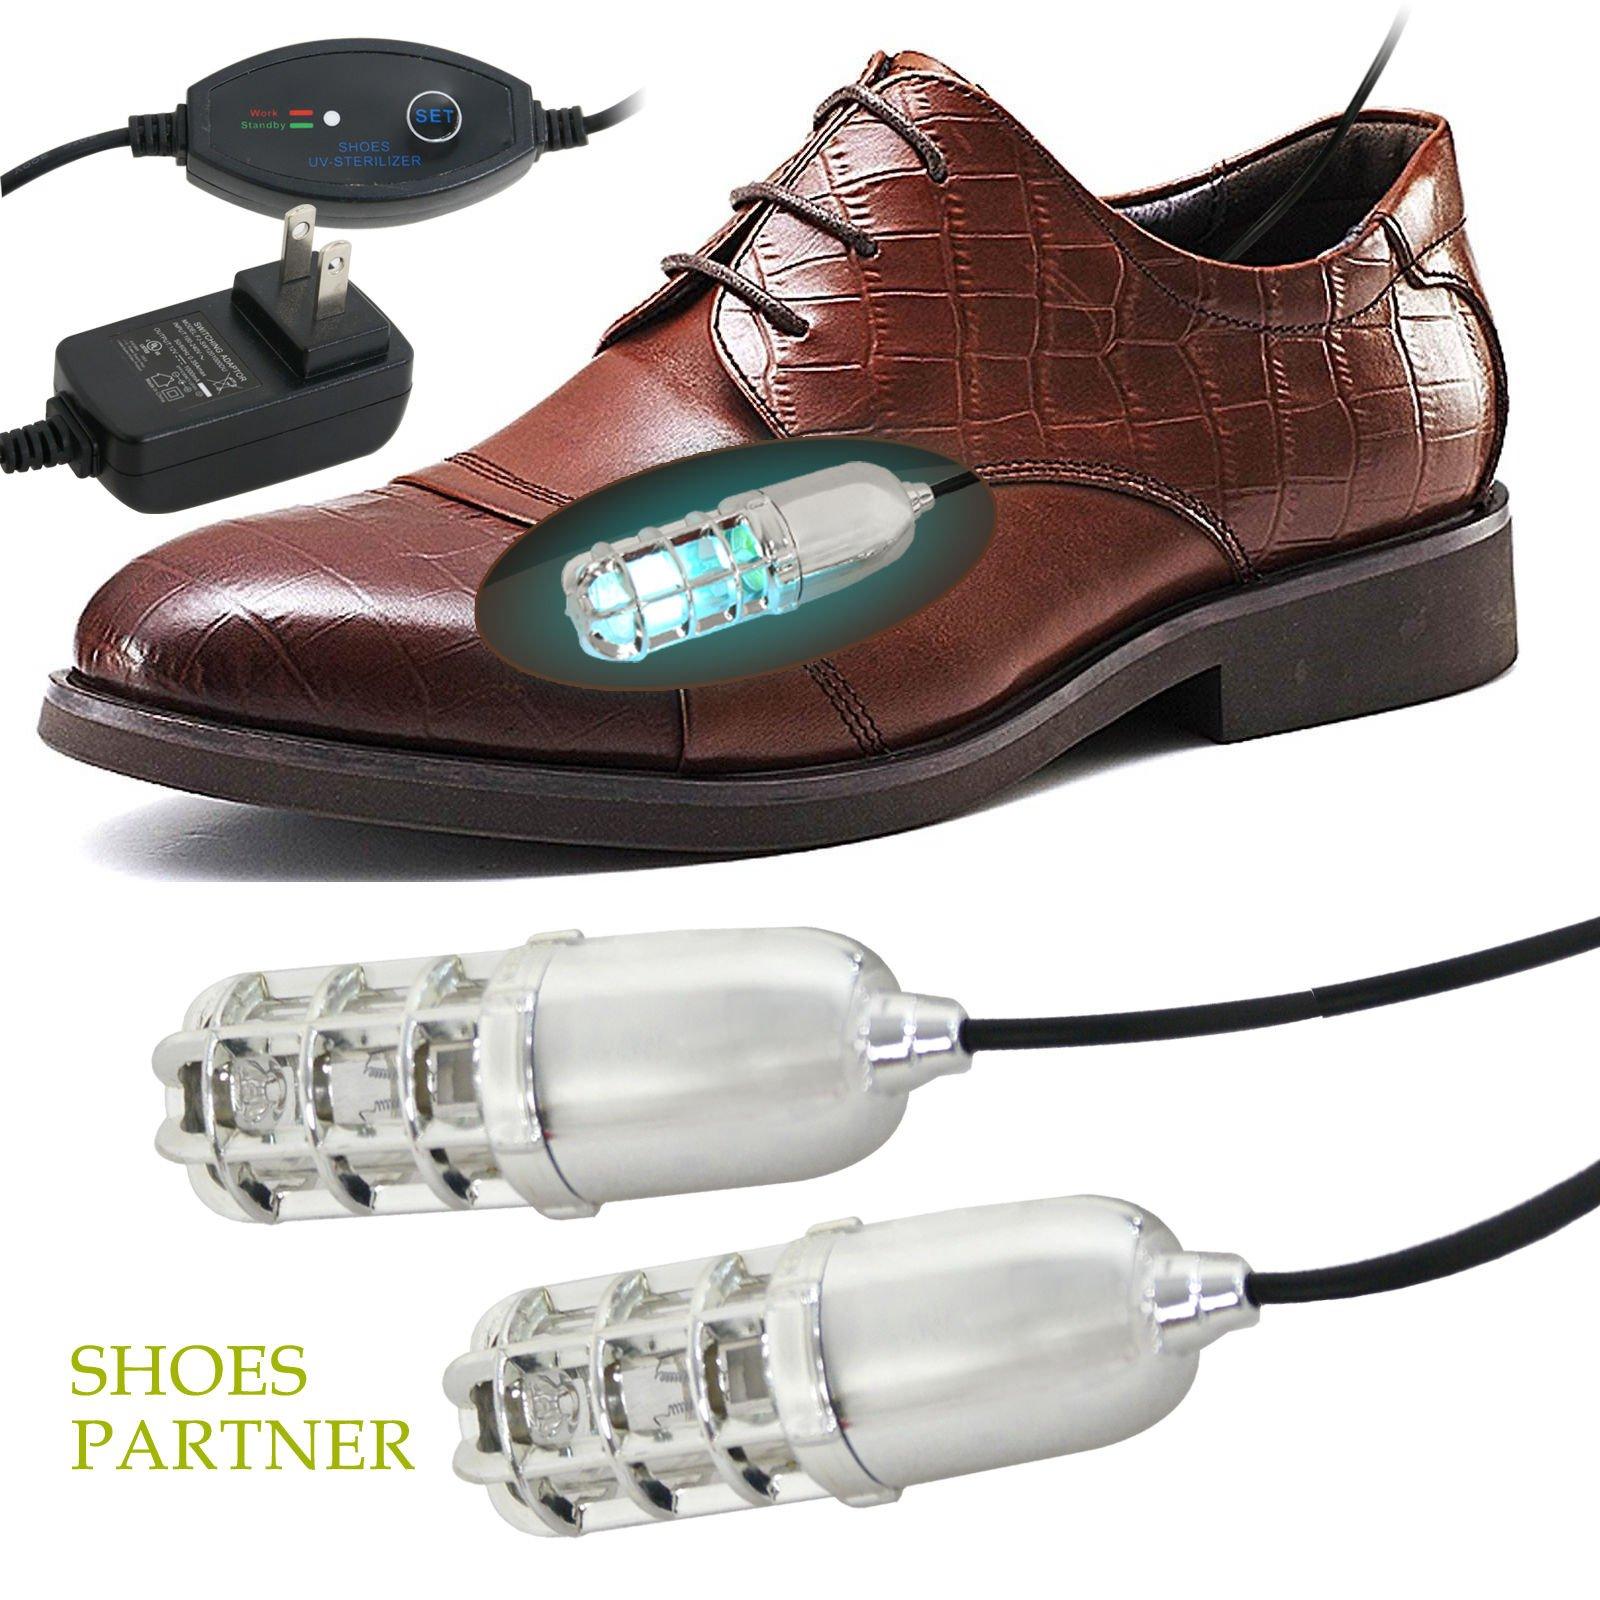 UBRTools Ultraviolet UV Shoes Dryer Deodorizer Sterilizer Sanitizer Kills Fungi & Odors